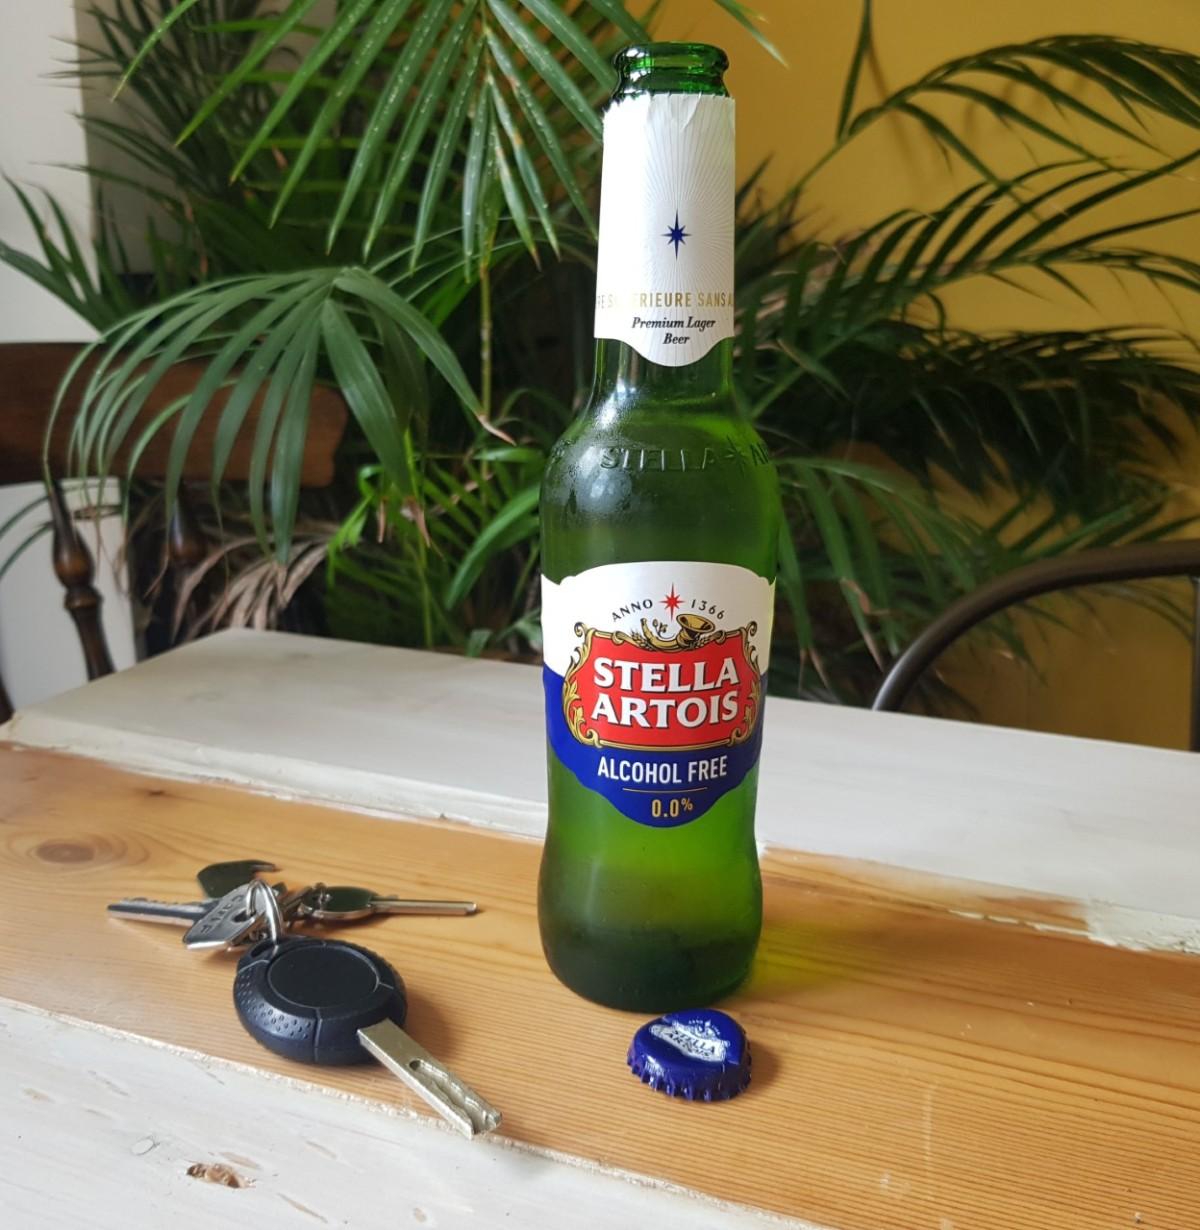 STELLA ARTOIS ALCOHOLFREE